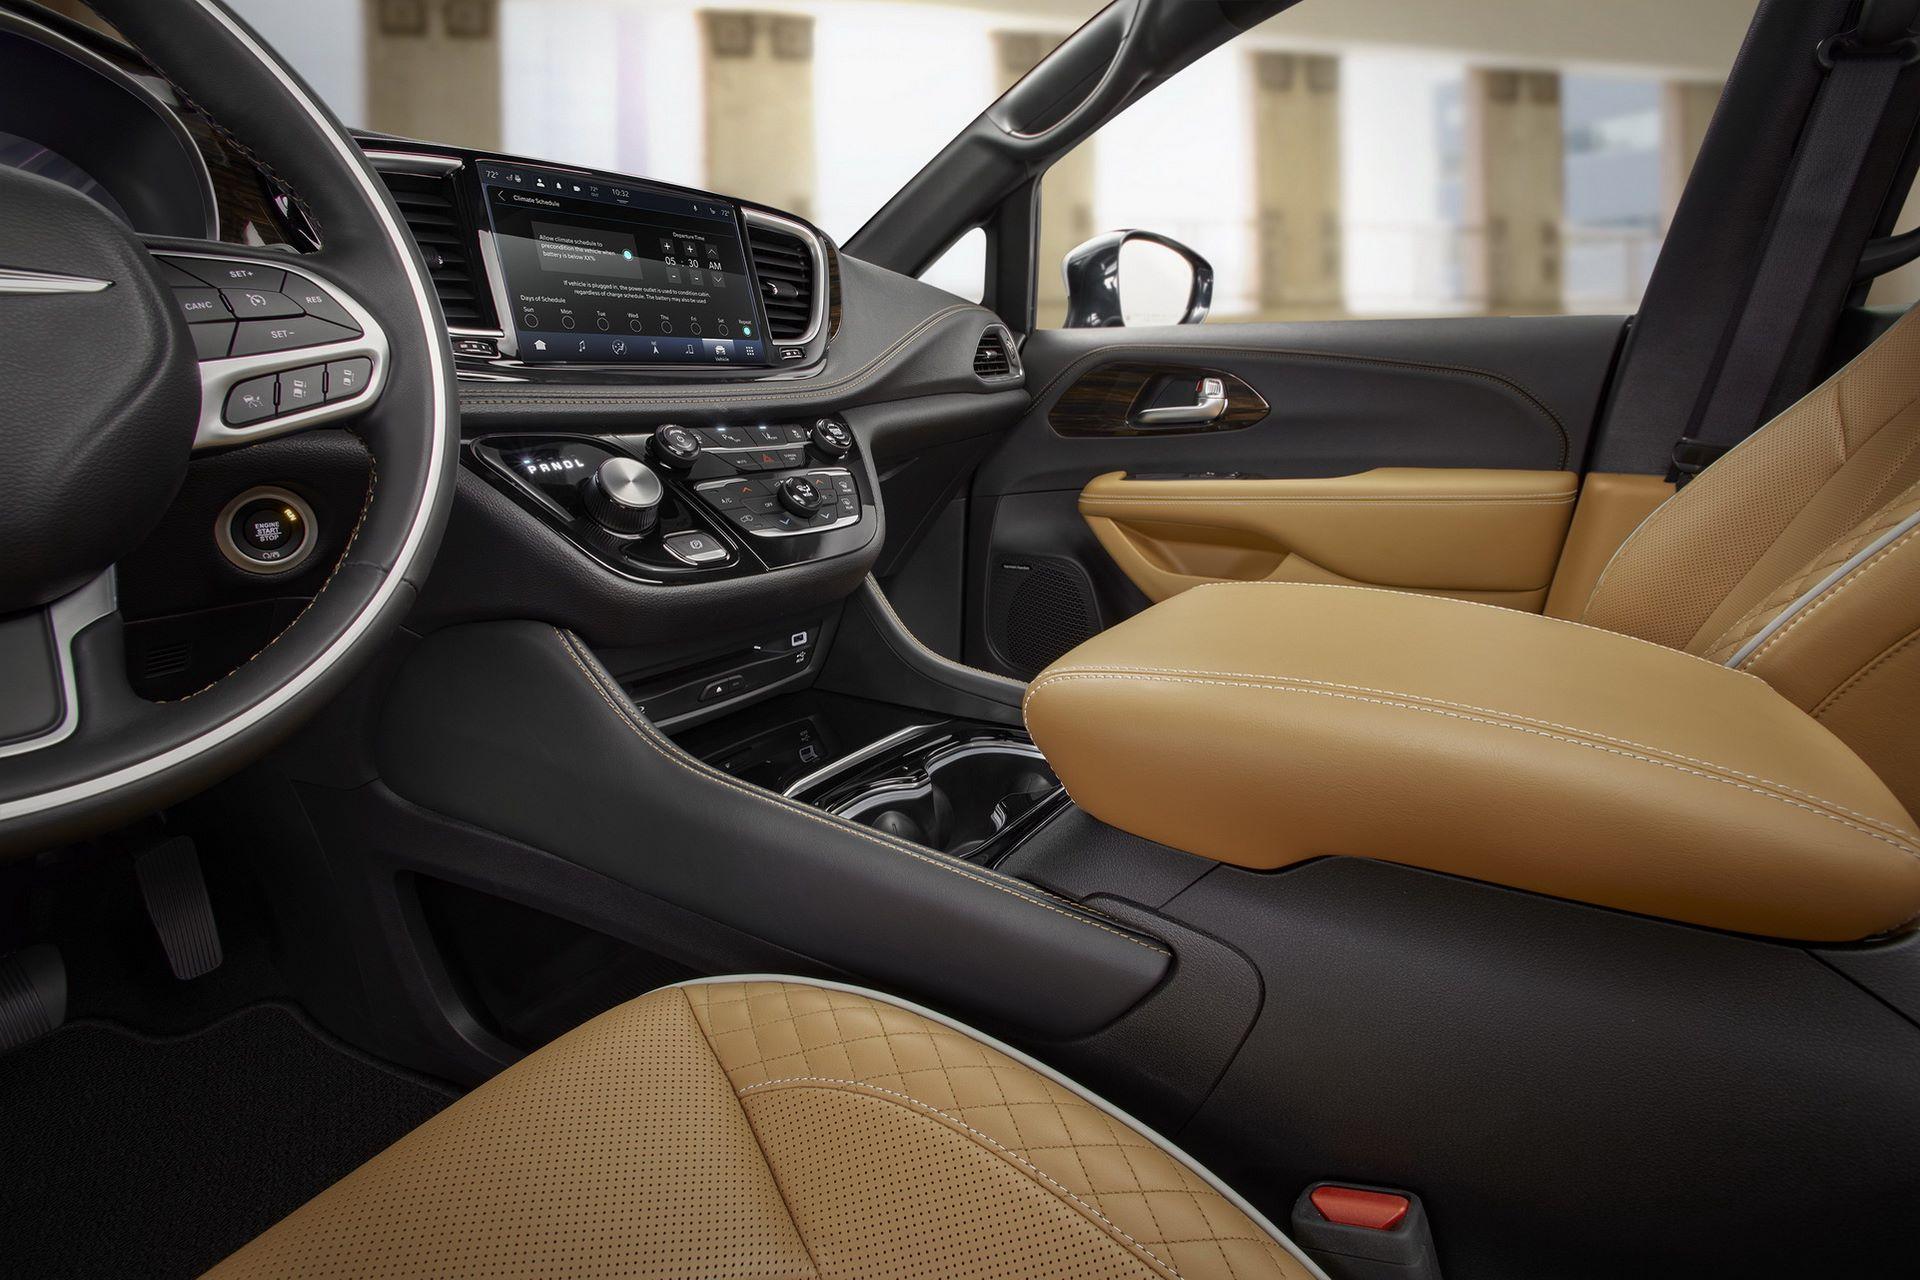 2021-Chrysler-Pacifica-72